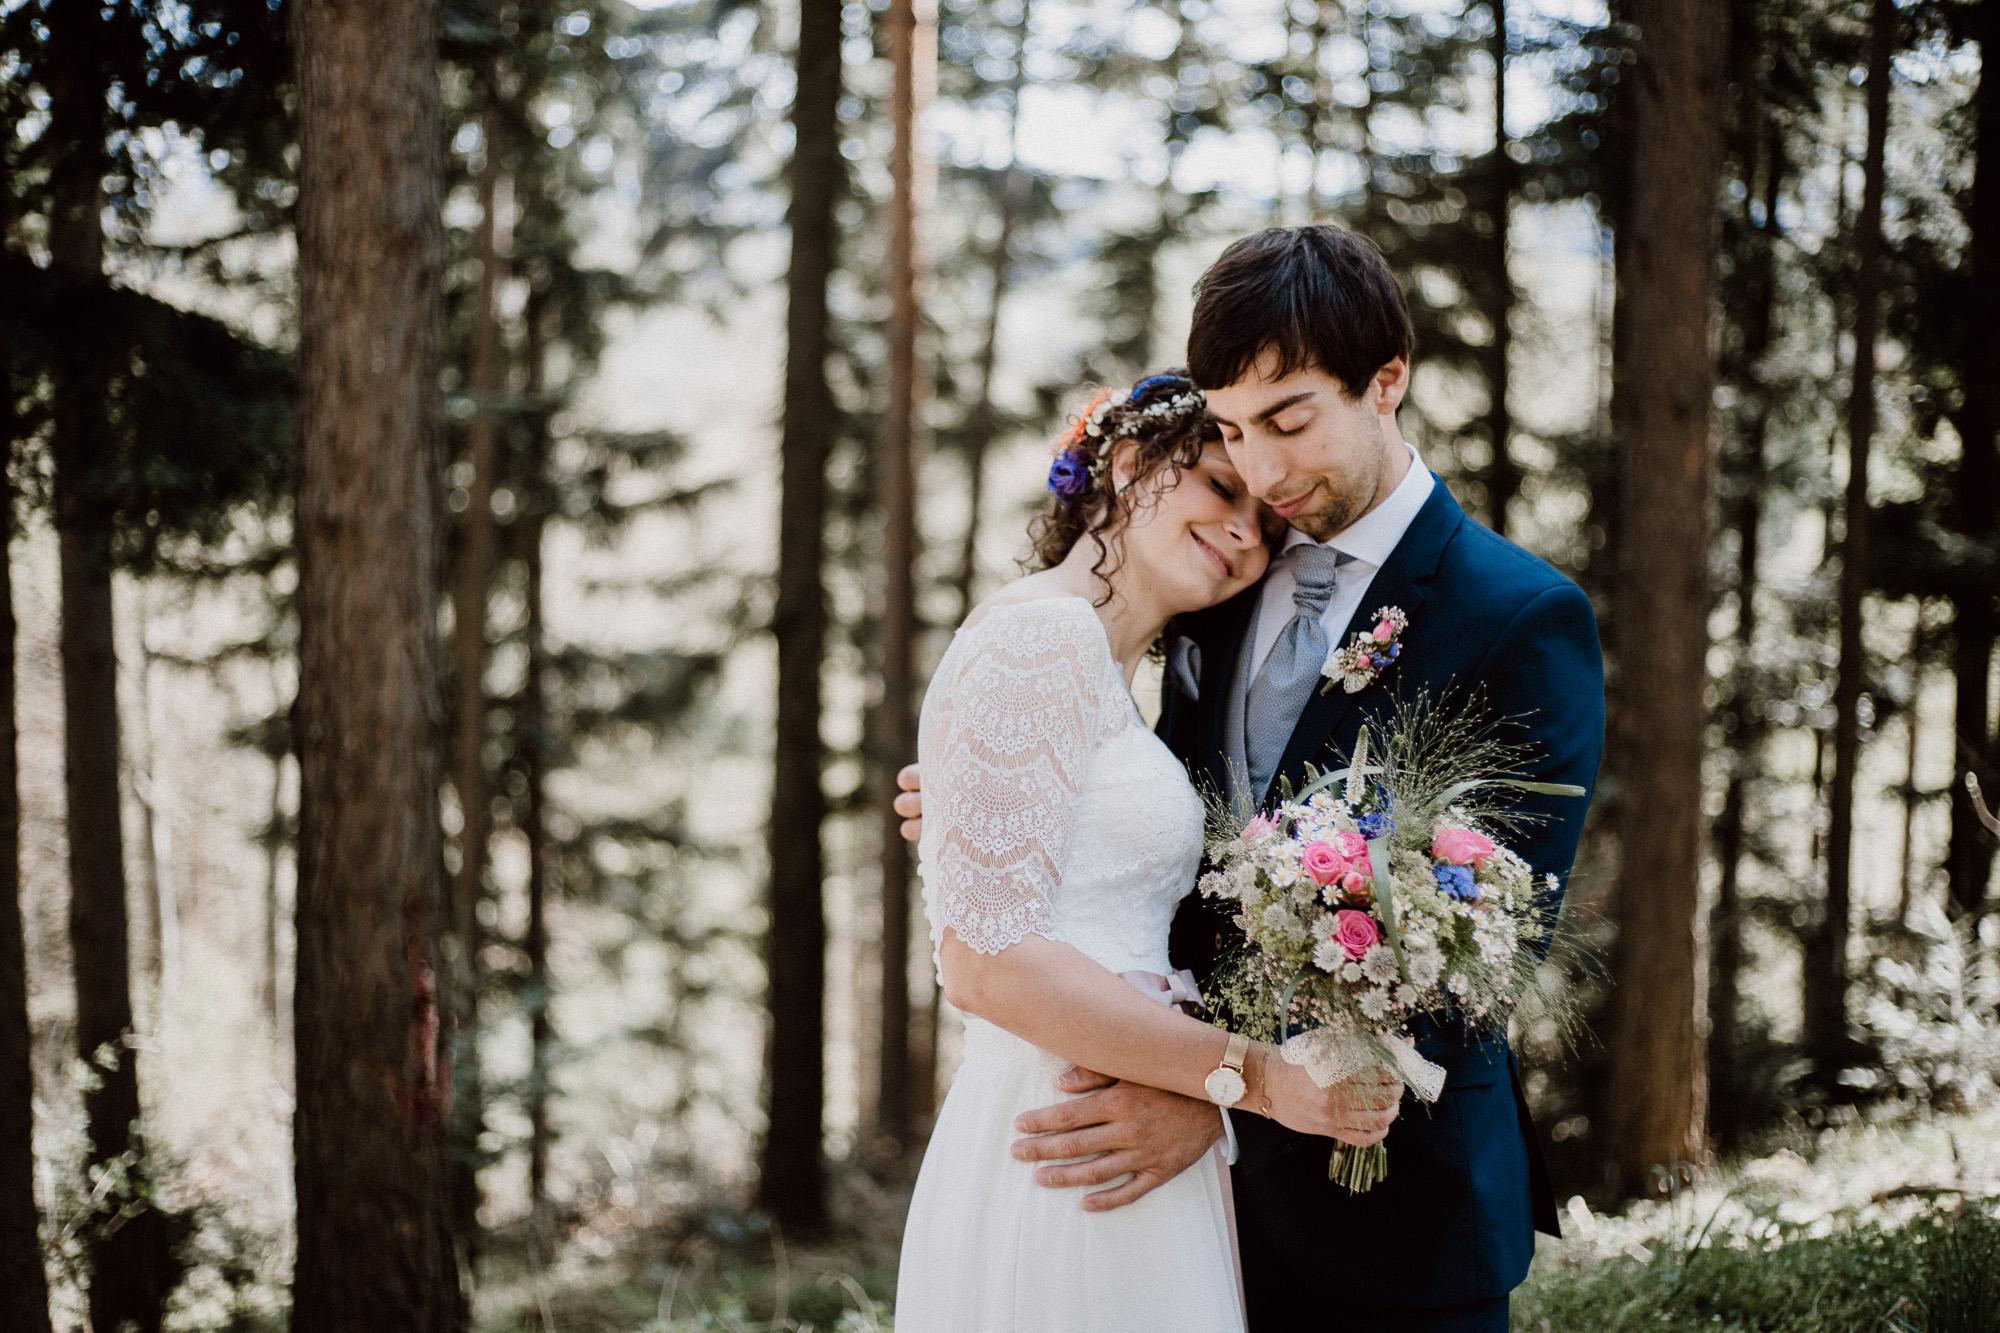 Hochzeitsfotograf Manuel Spors